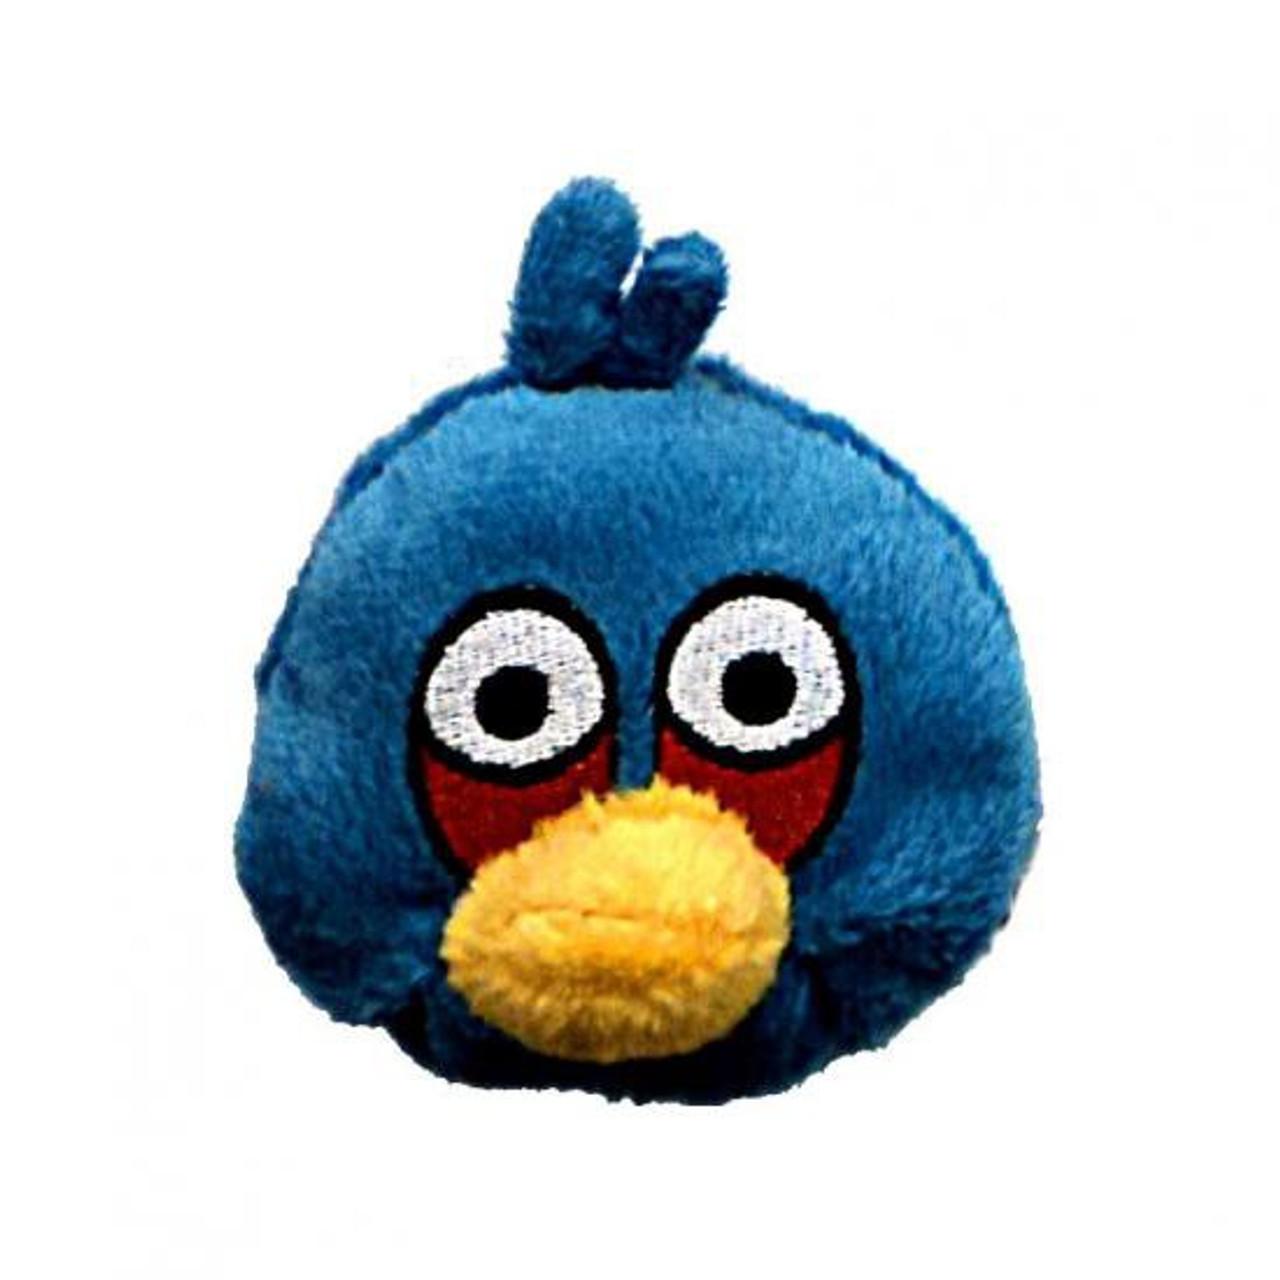 Angry Birds Blue Bird 3 Bean Bag Plush Commonwealth Toys Toywiz